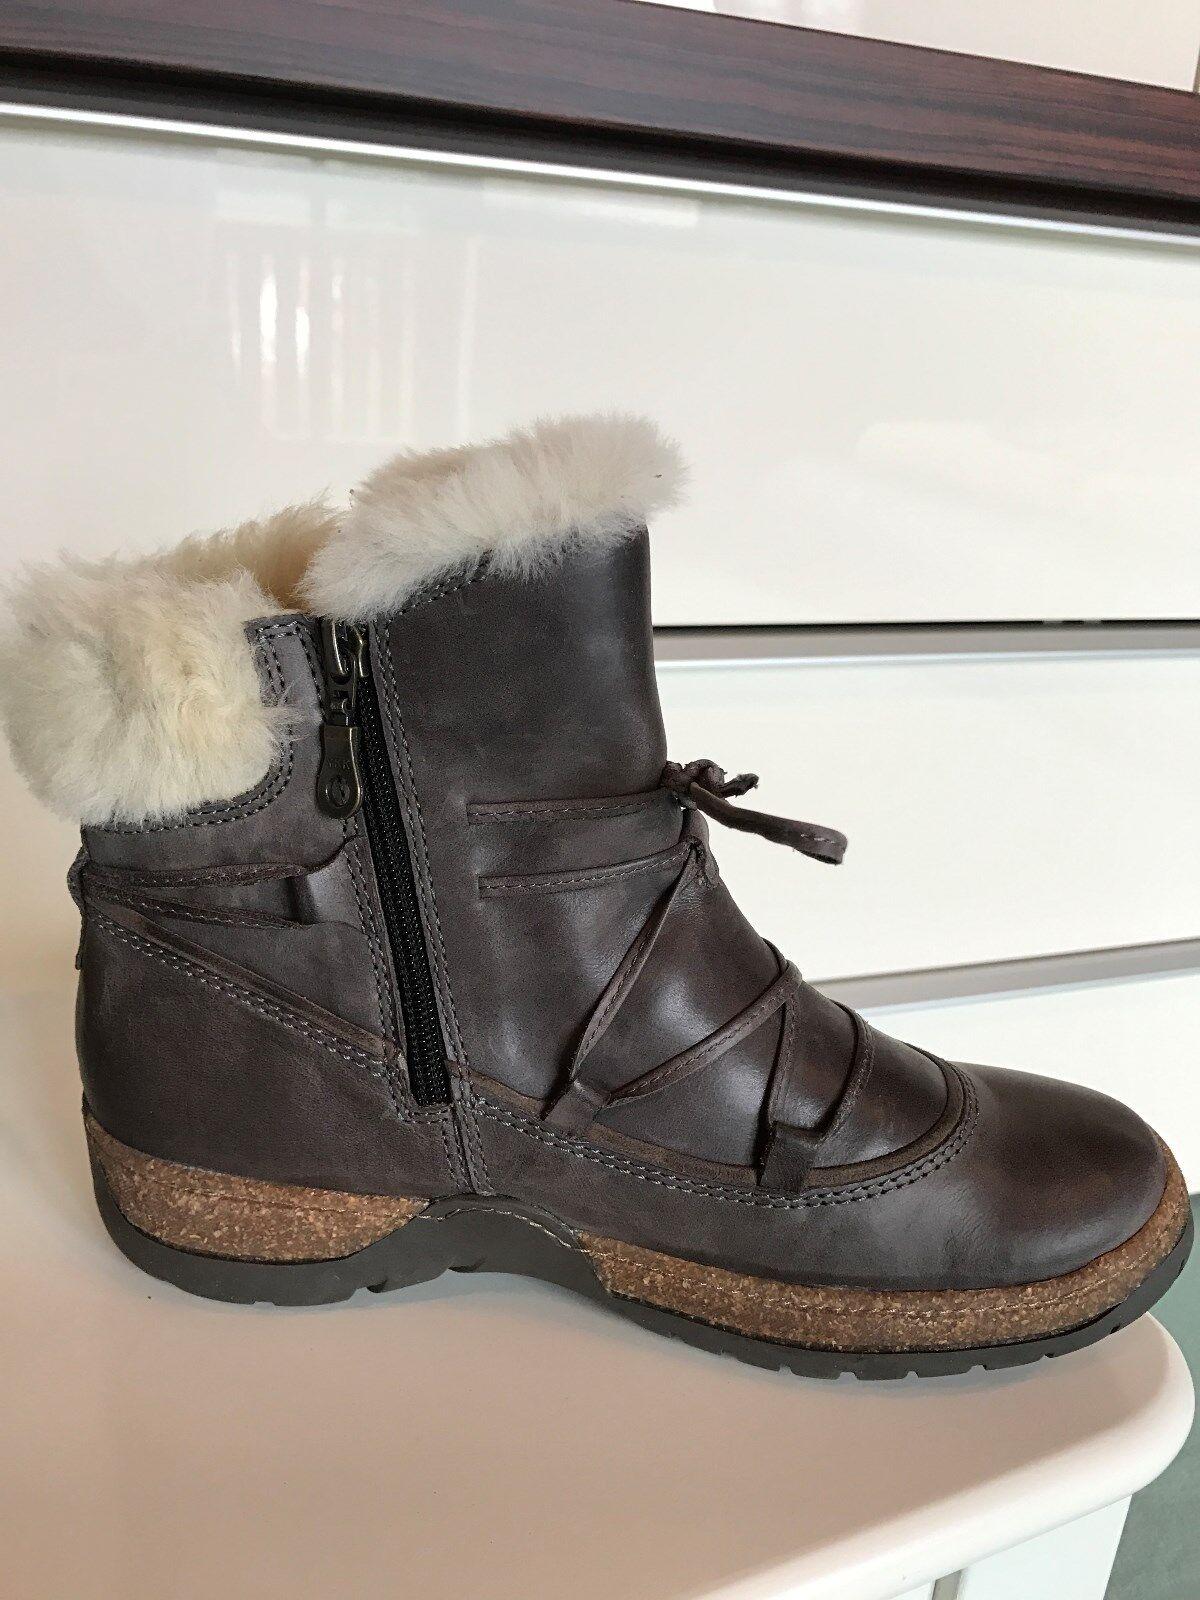 aa721d82fcd ... Zapatos señora, John Blue Bear, nuevo, sin usar, cuero, tamaño 39 ...